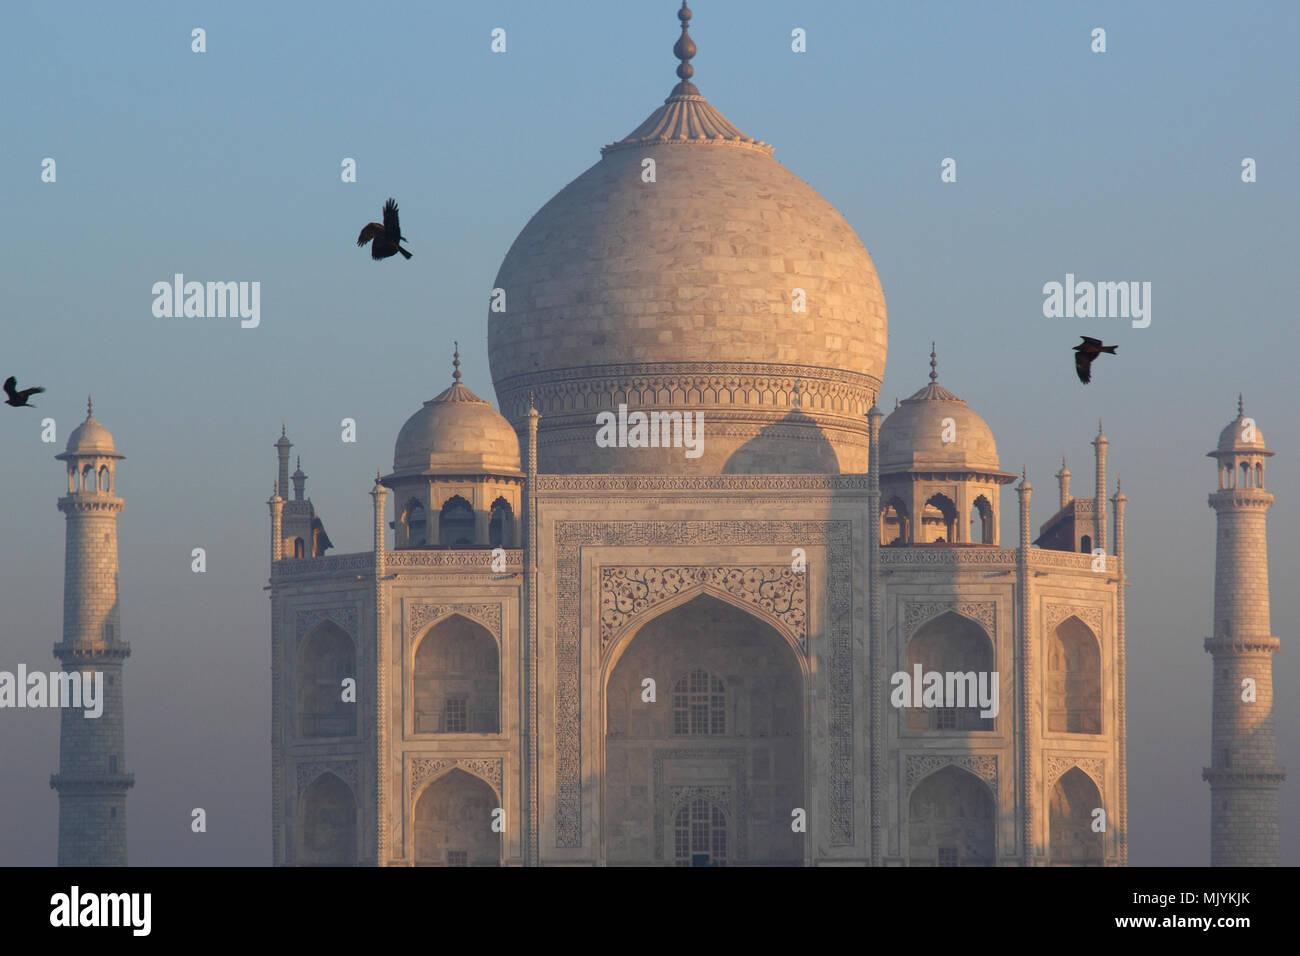 Panoramablick auf das Taj Mahal bei Sonnenaufgang Stockbild